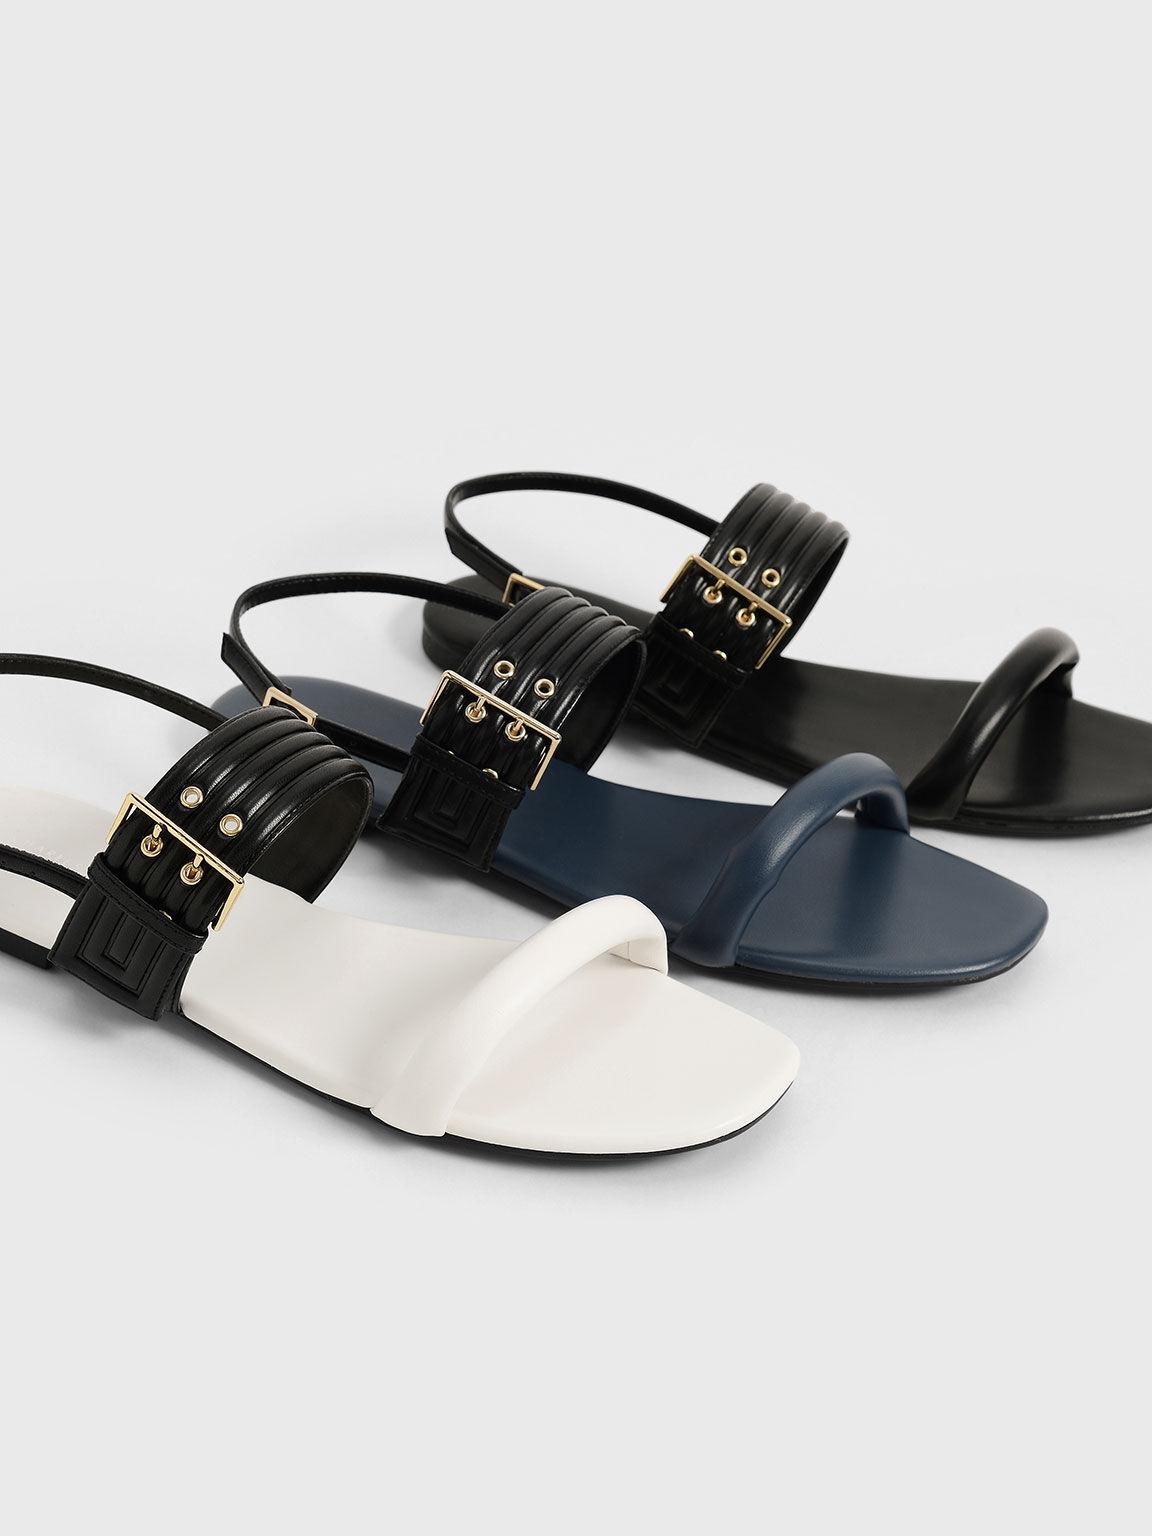 Puffy Grommet Sandals, Black, hi-res